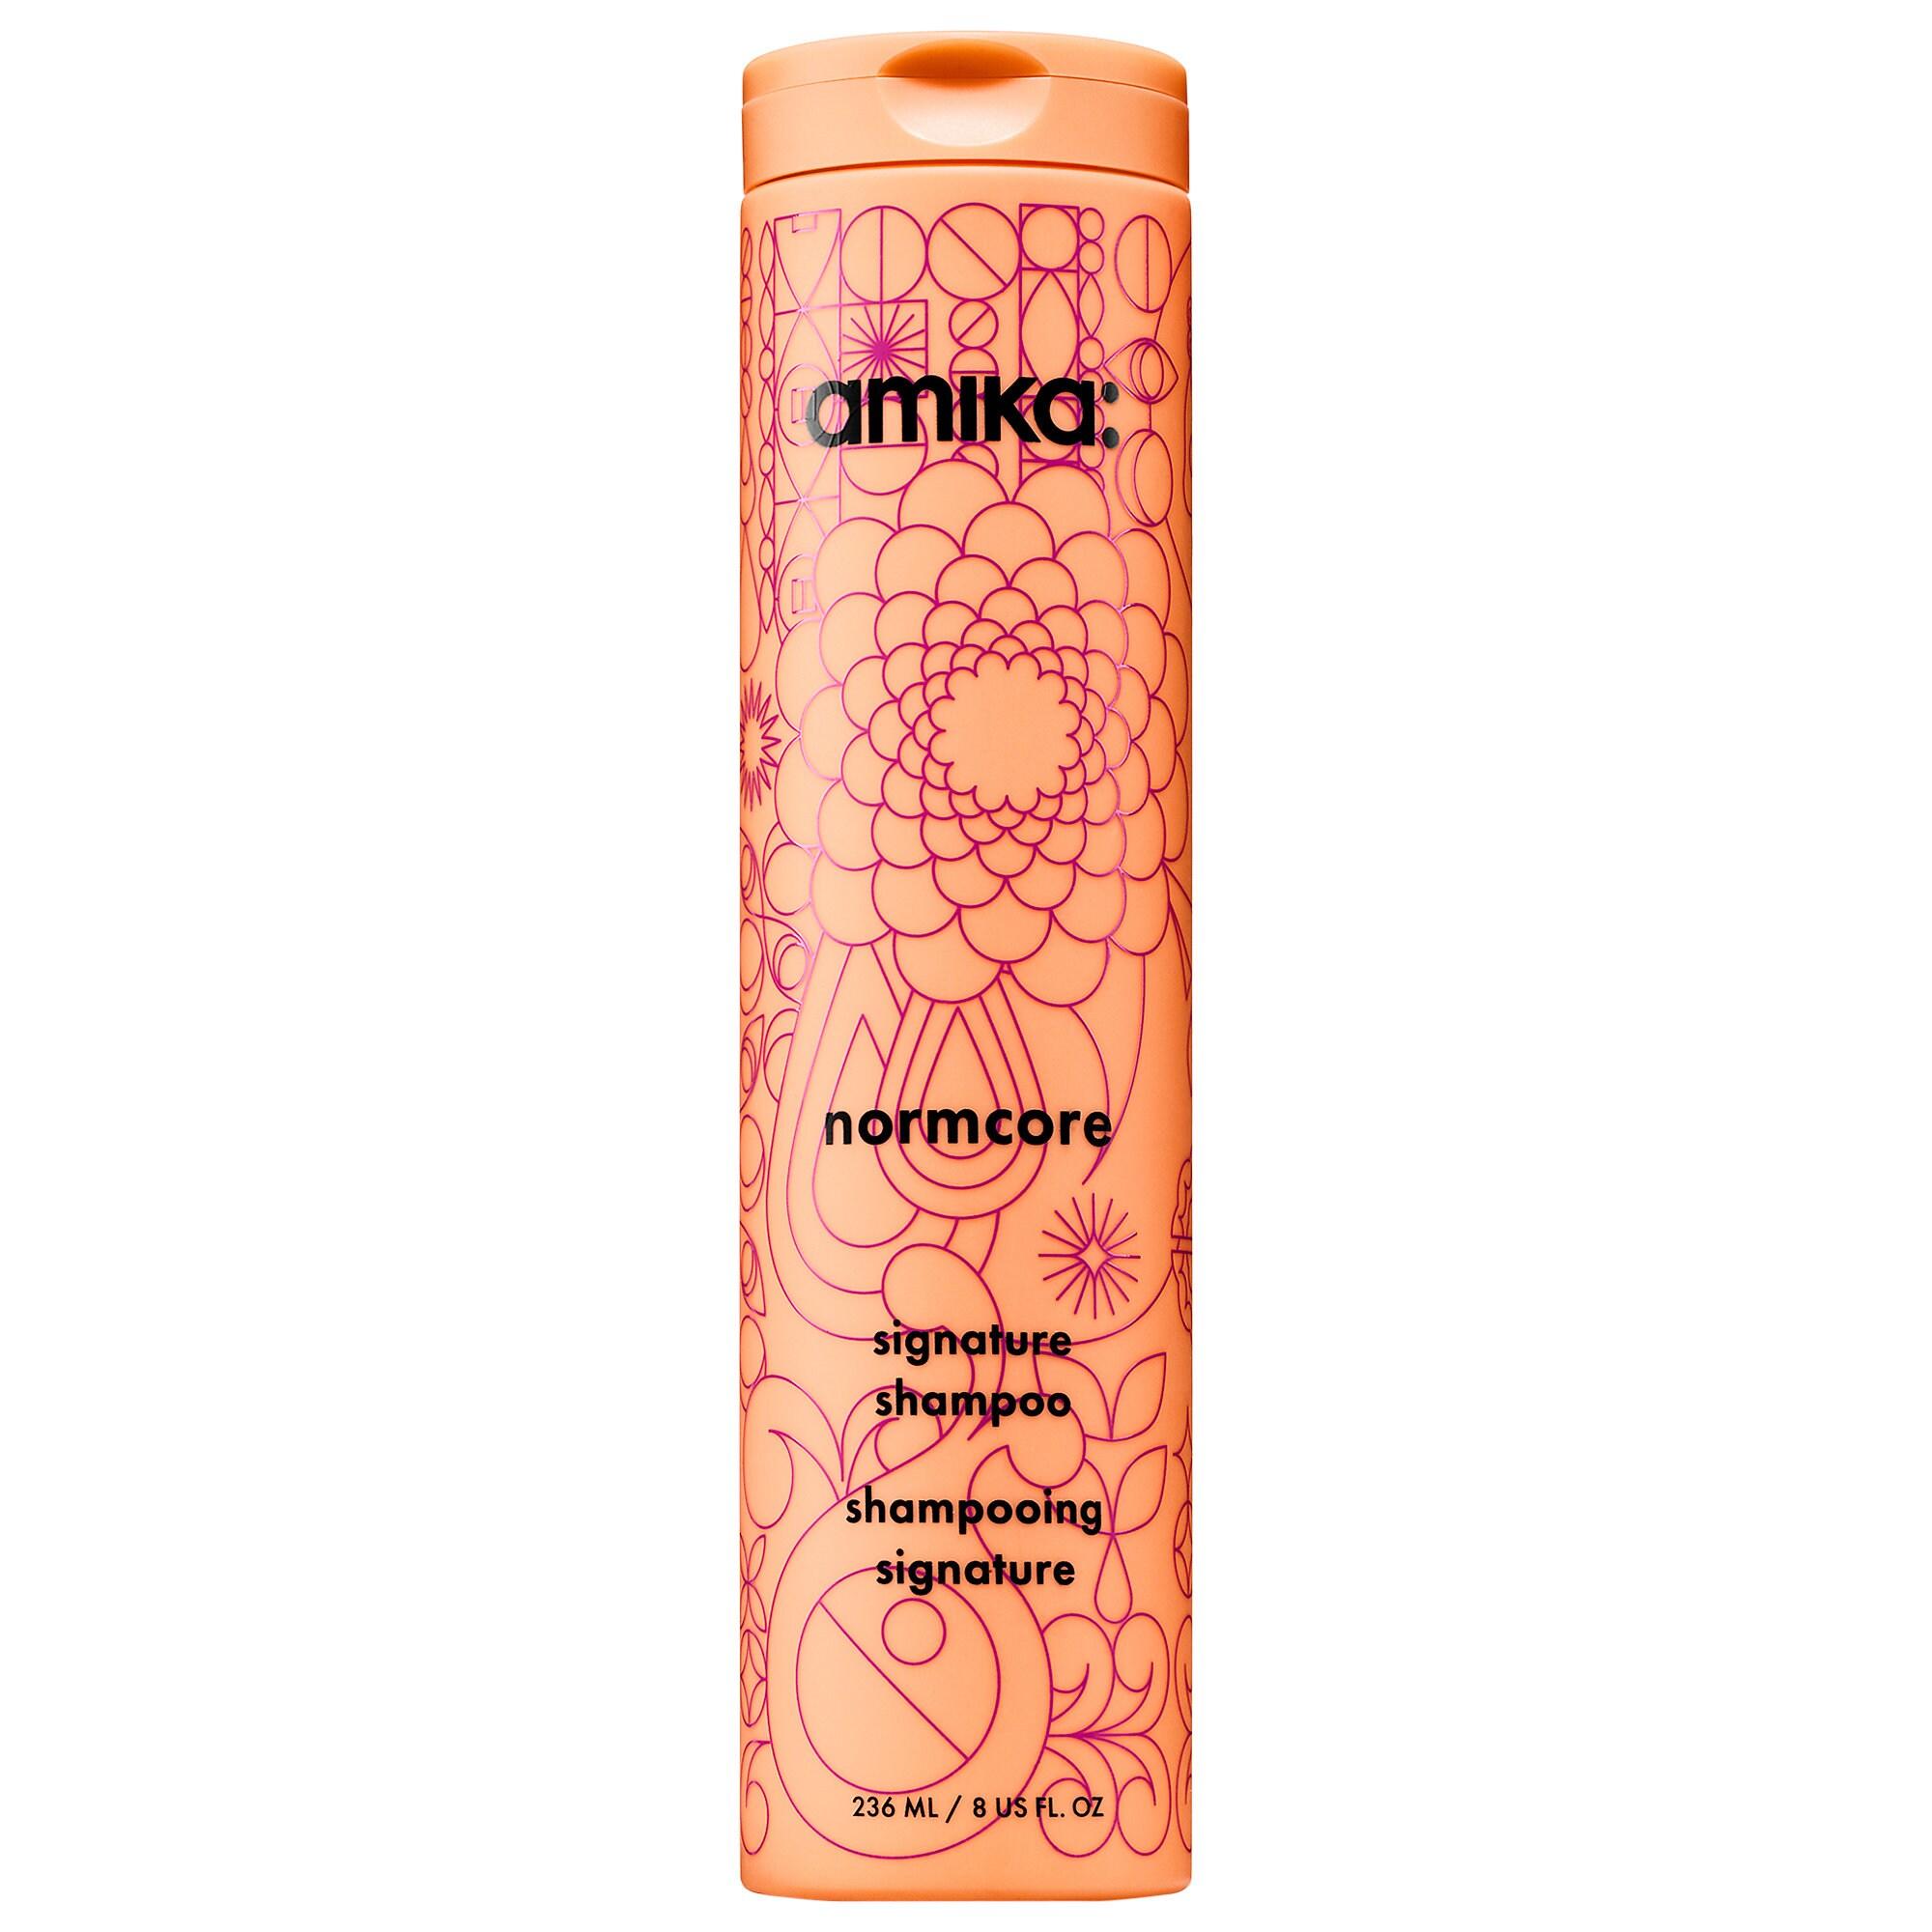 Amika - Normcore Sulfate Free Shampoo